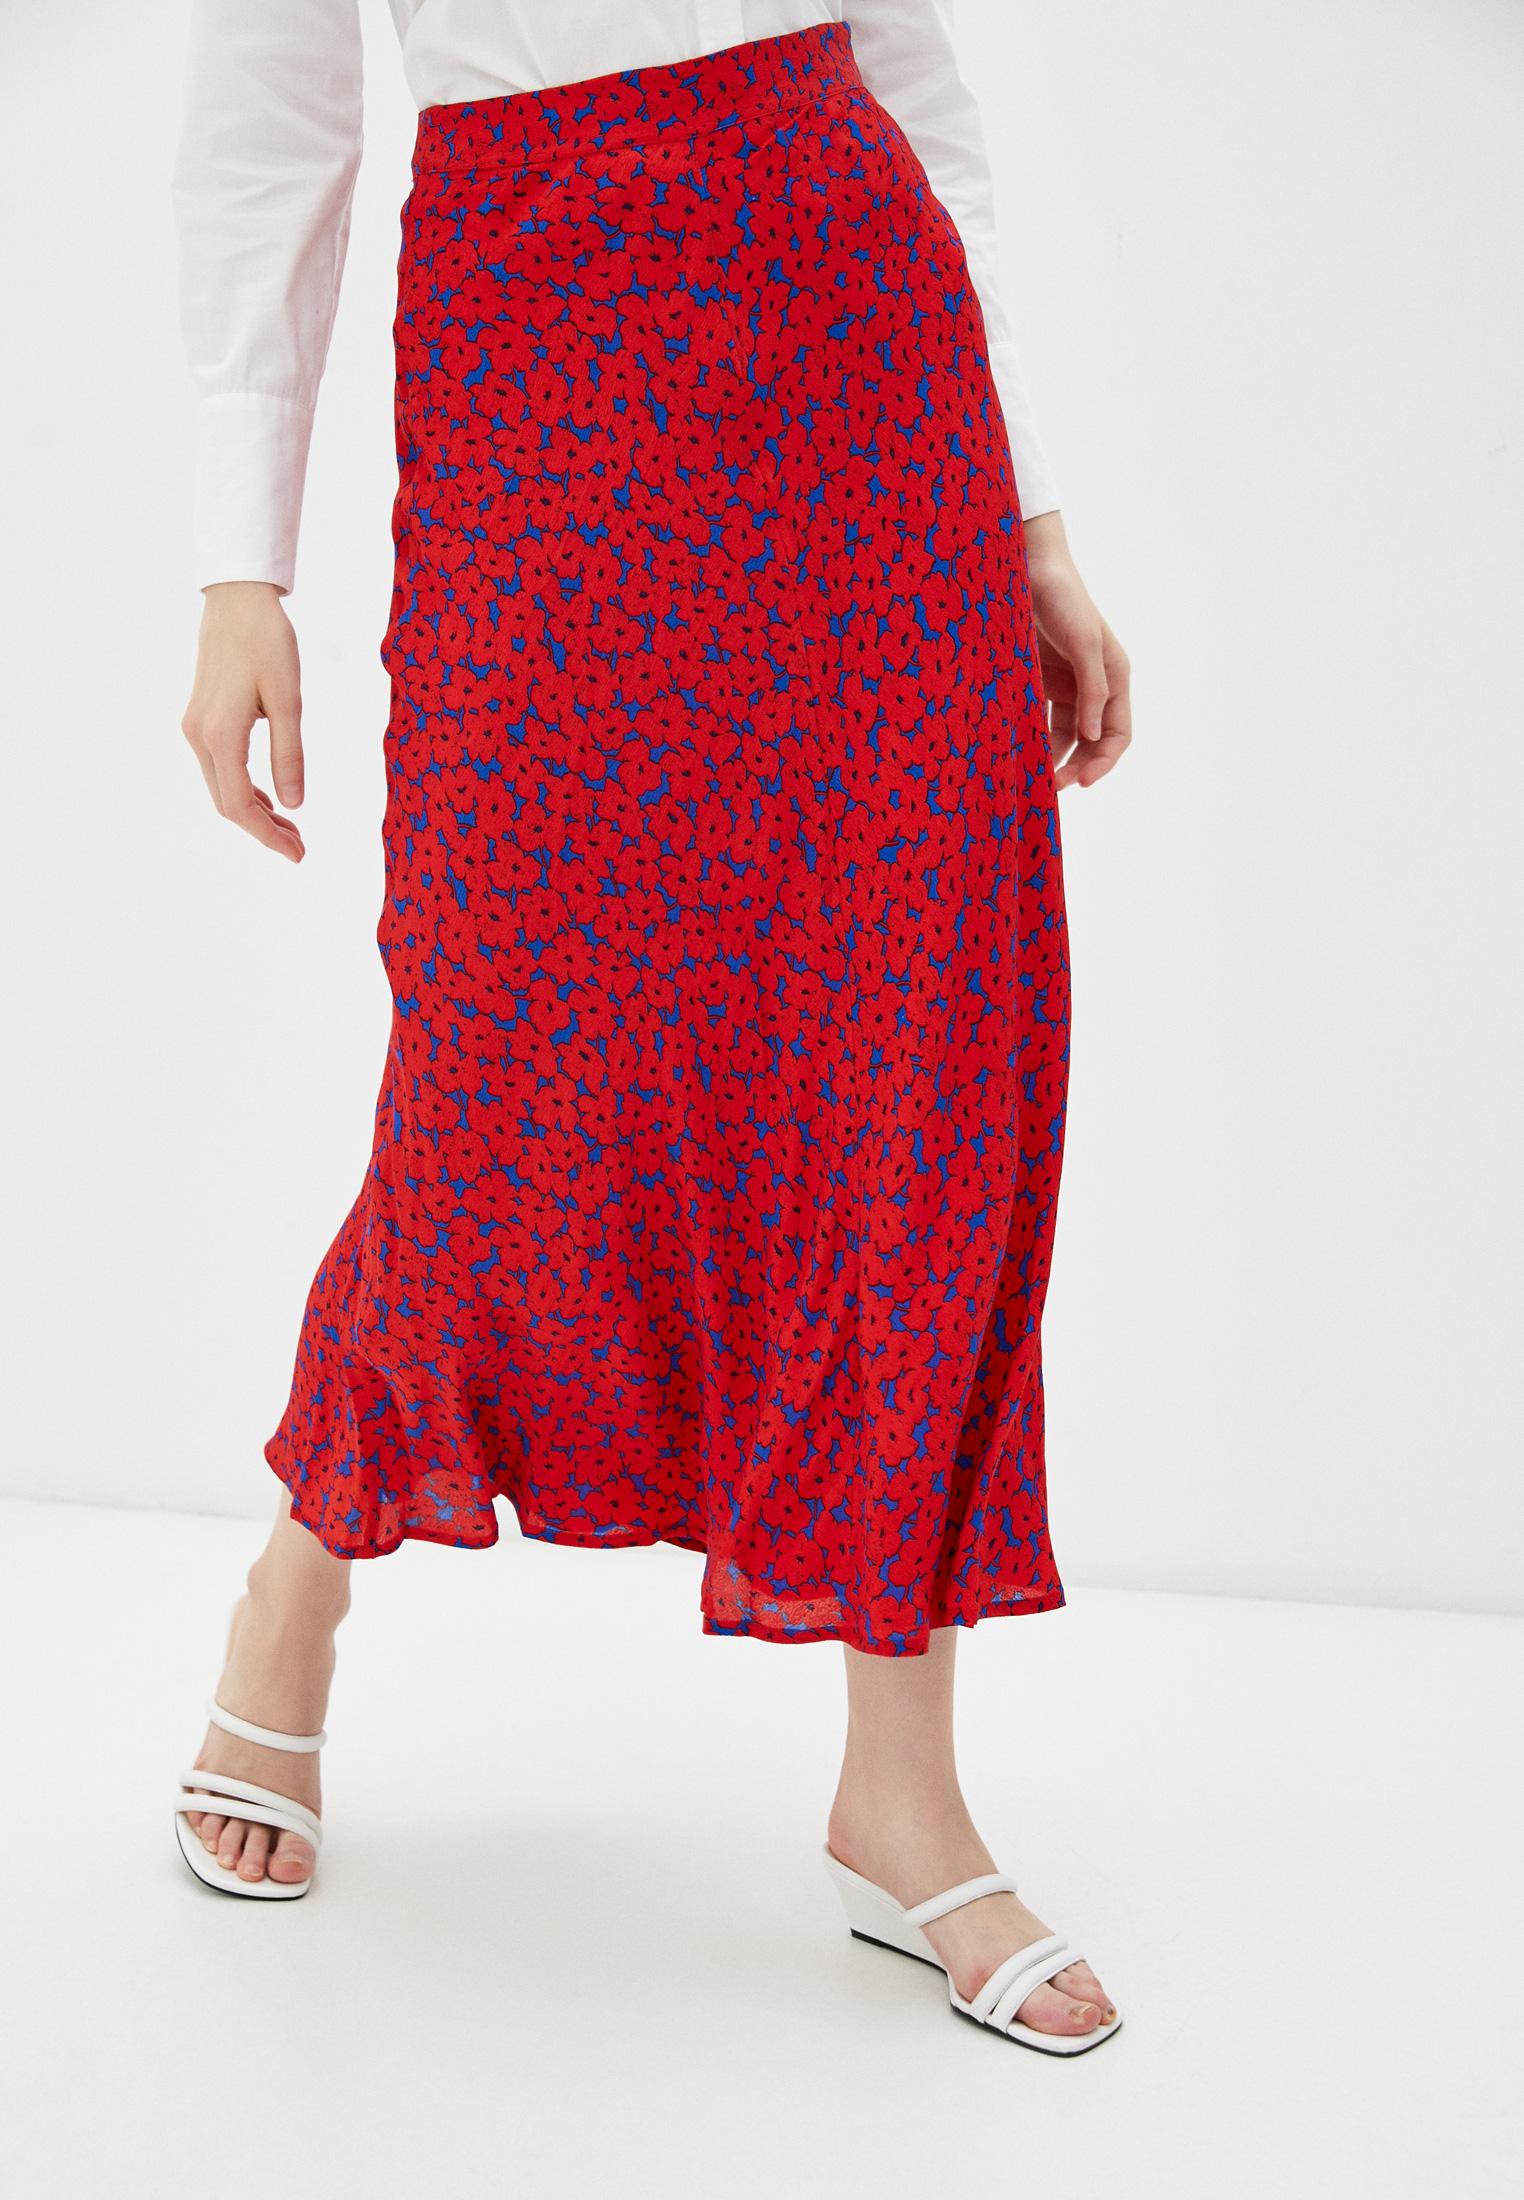 Прямая юбка Tommy Hilfiger (Томми Хилфигер) WW0WW30321